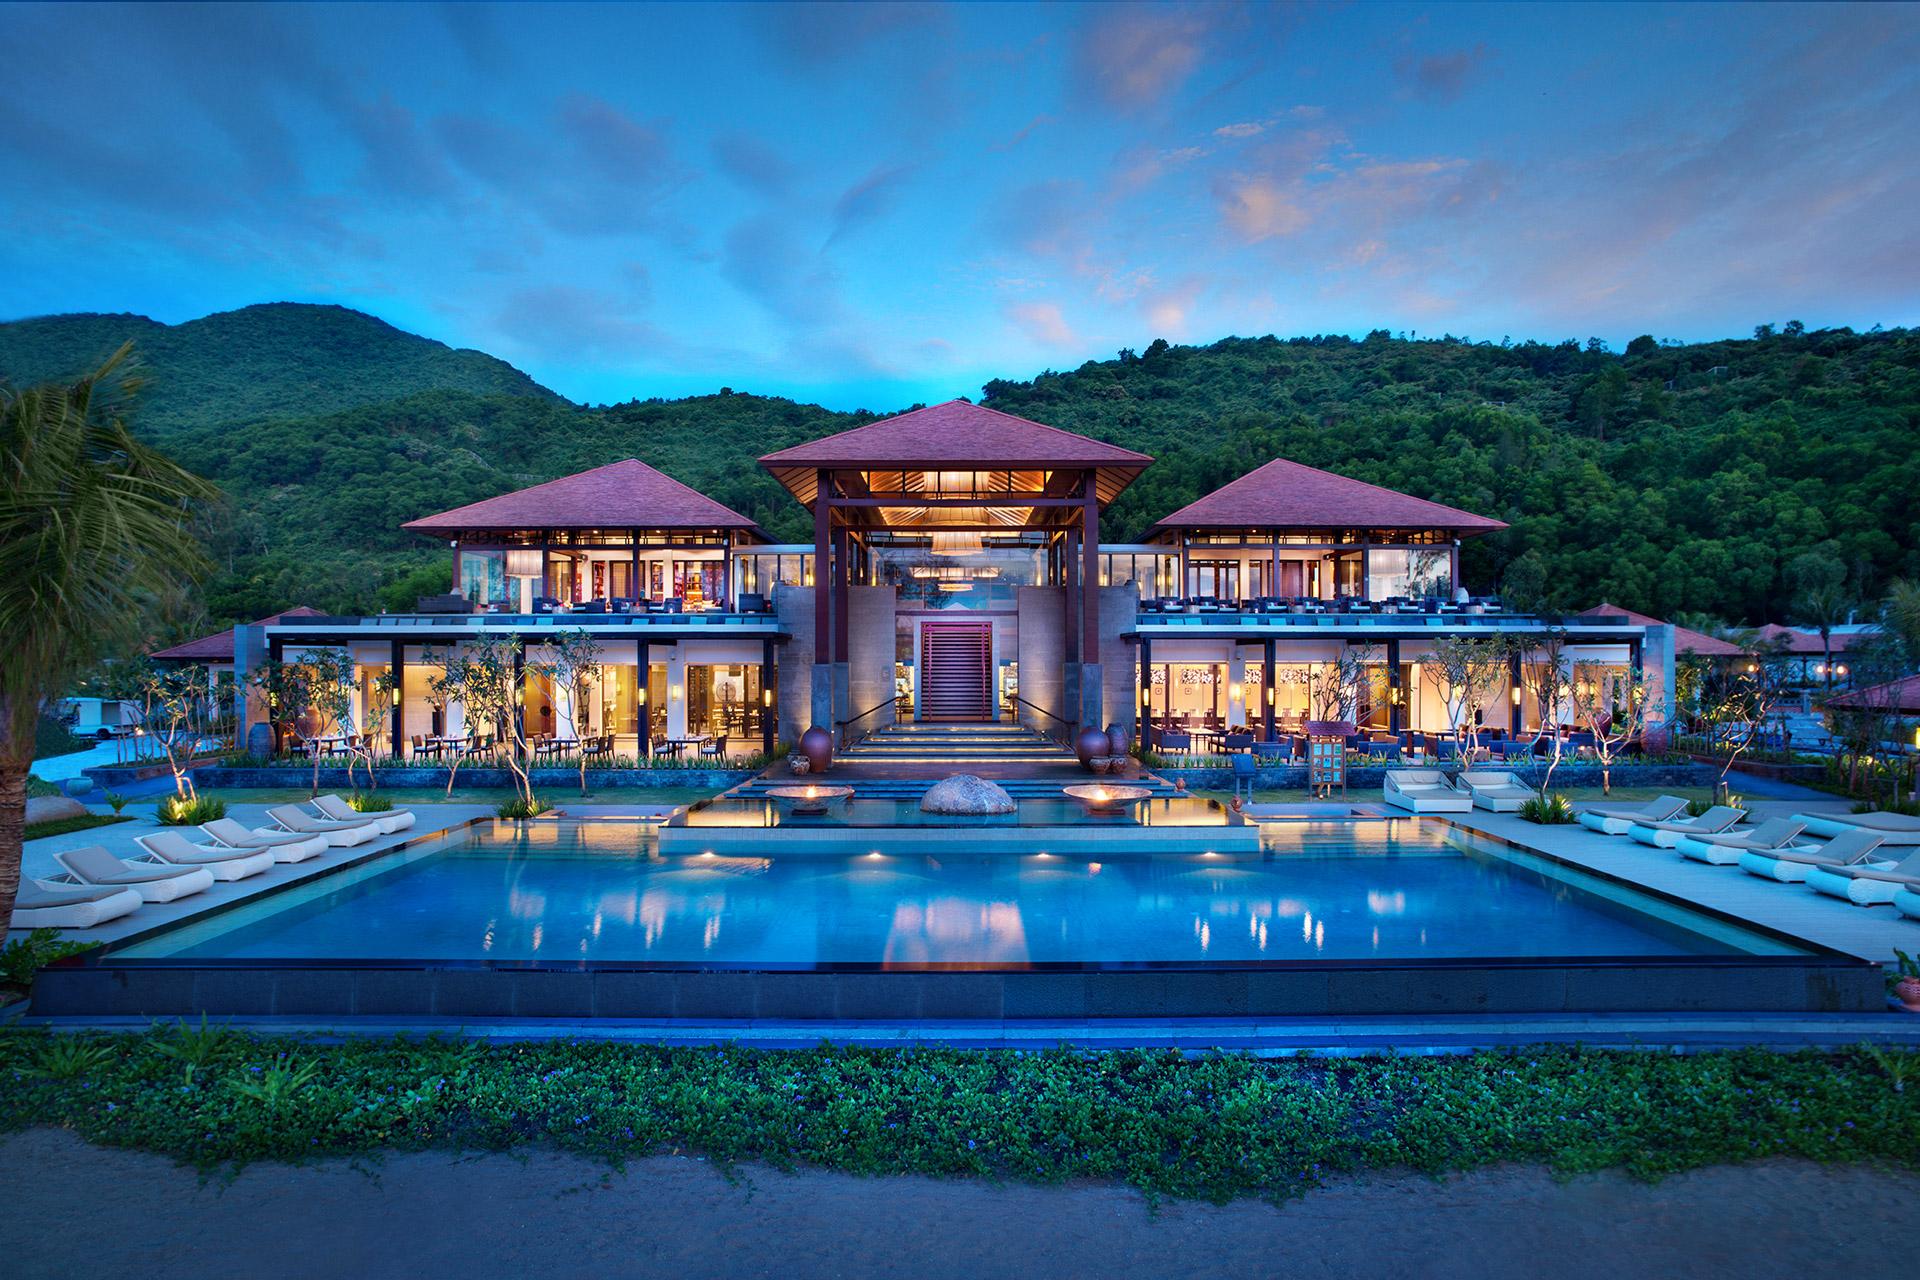 Banyan Tree Hotel under Laguna Lăng Cô Resort